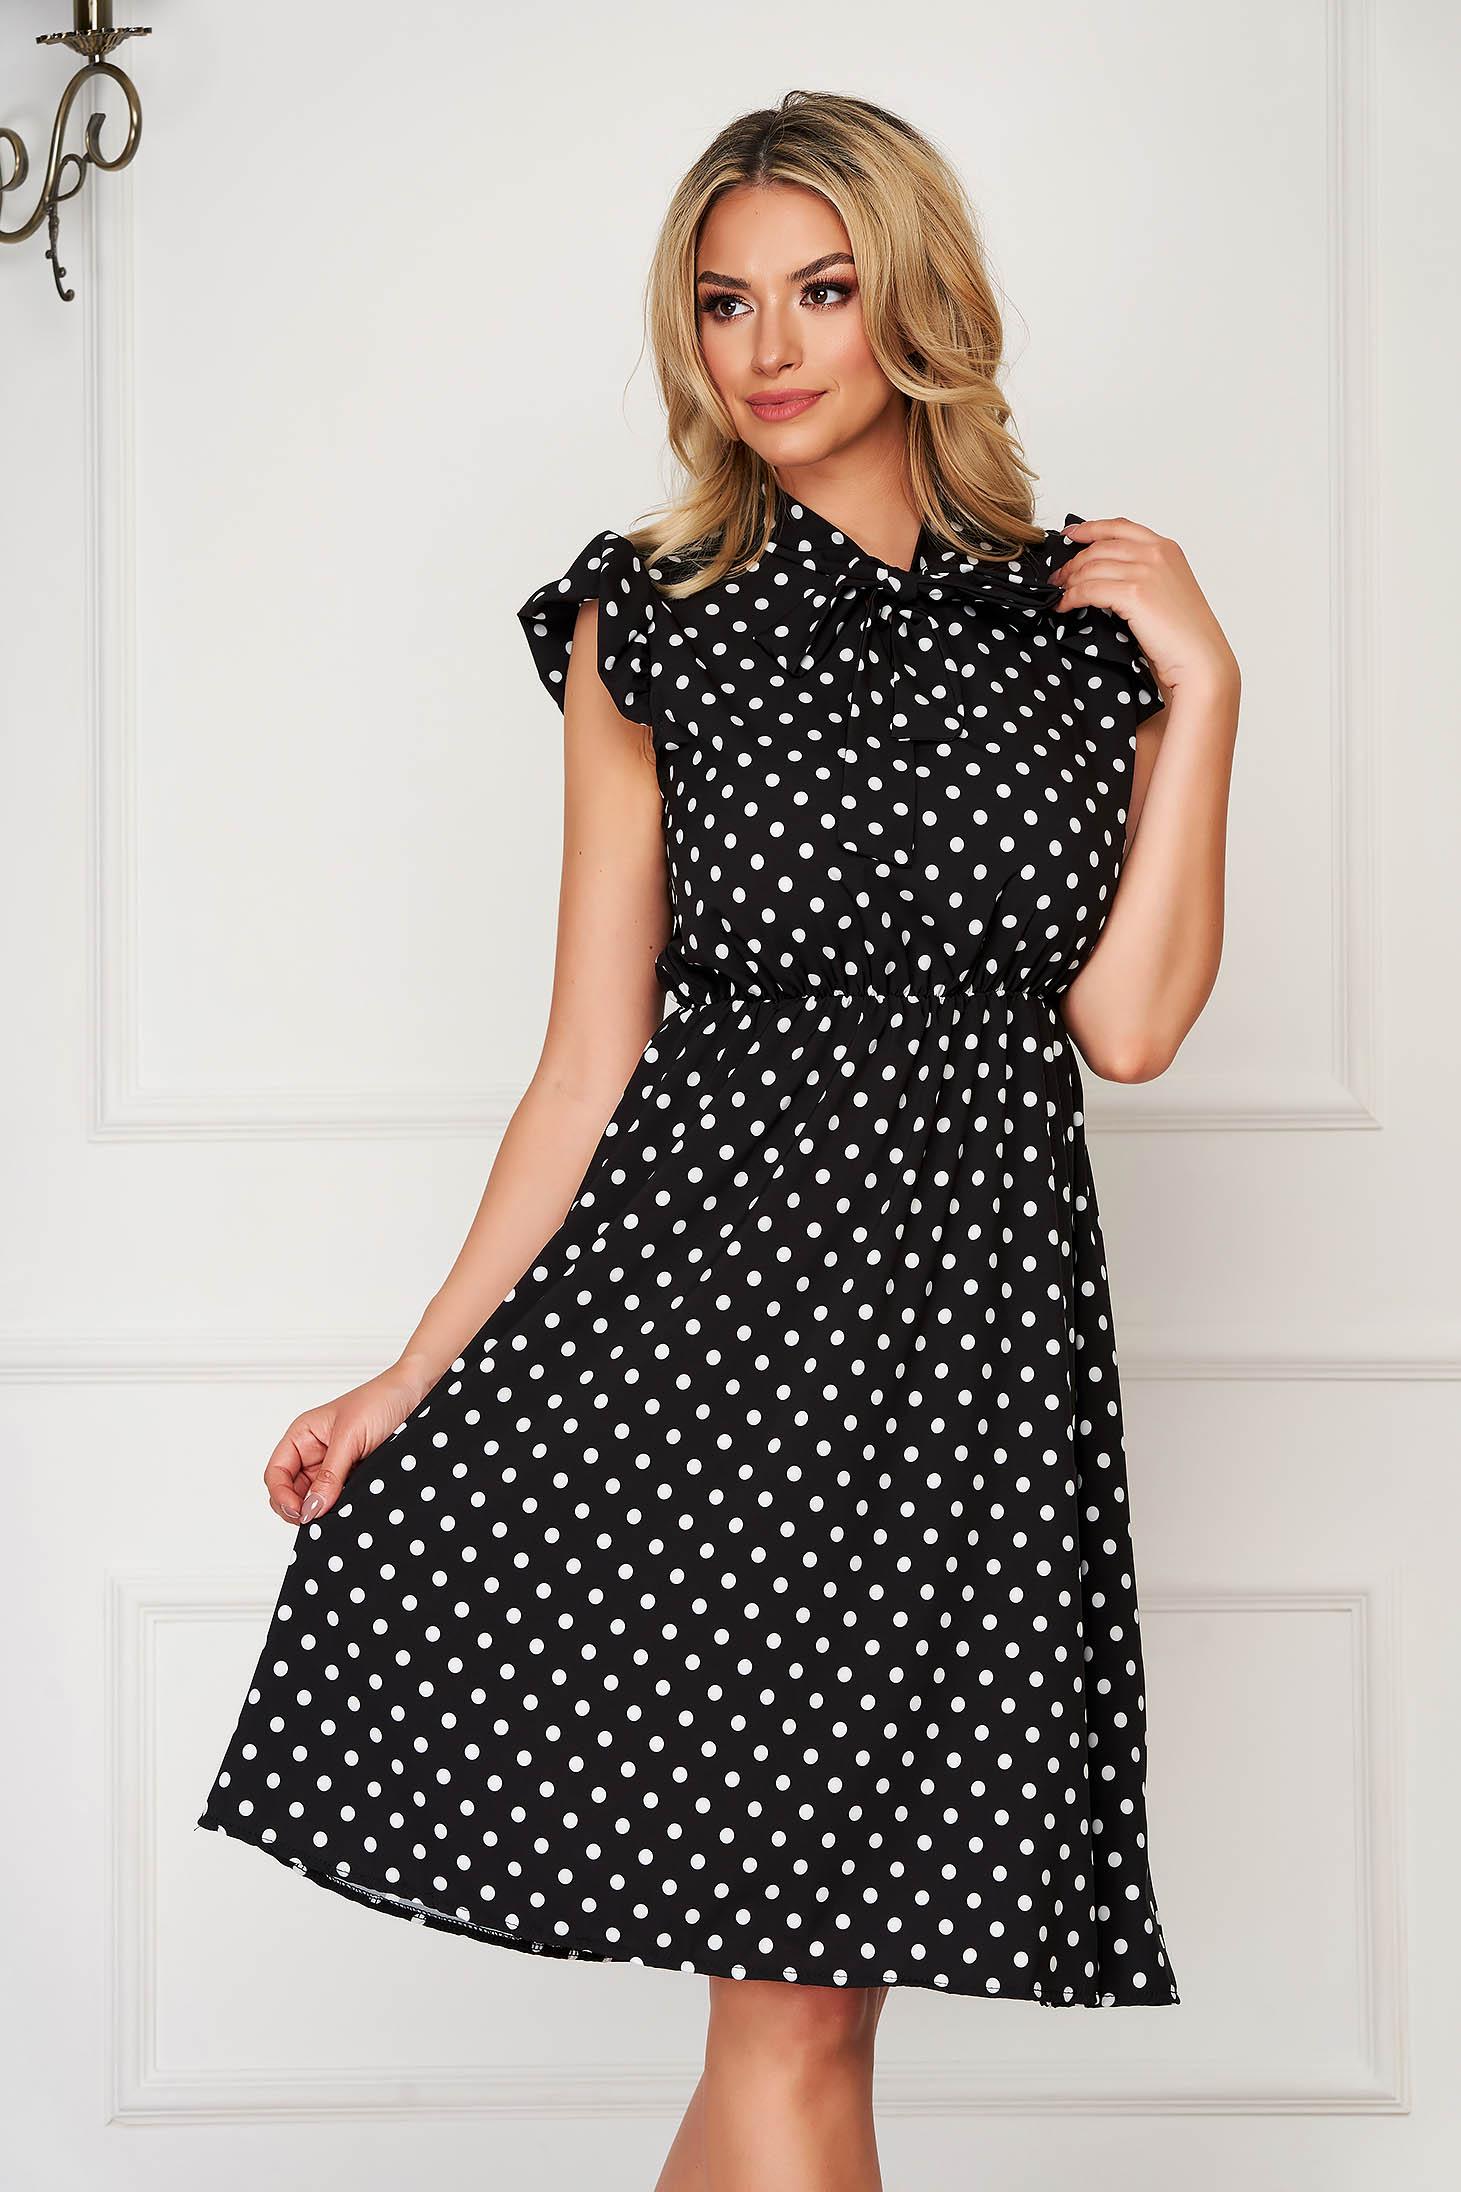 Black dress short cut daily cloche dots print